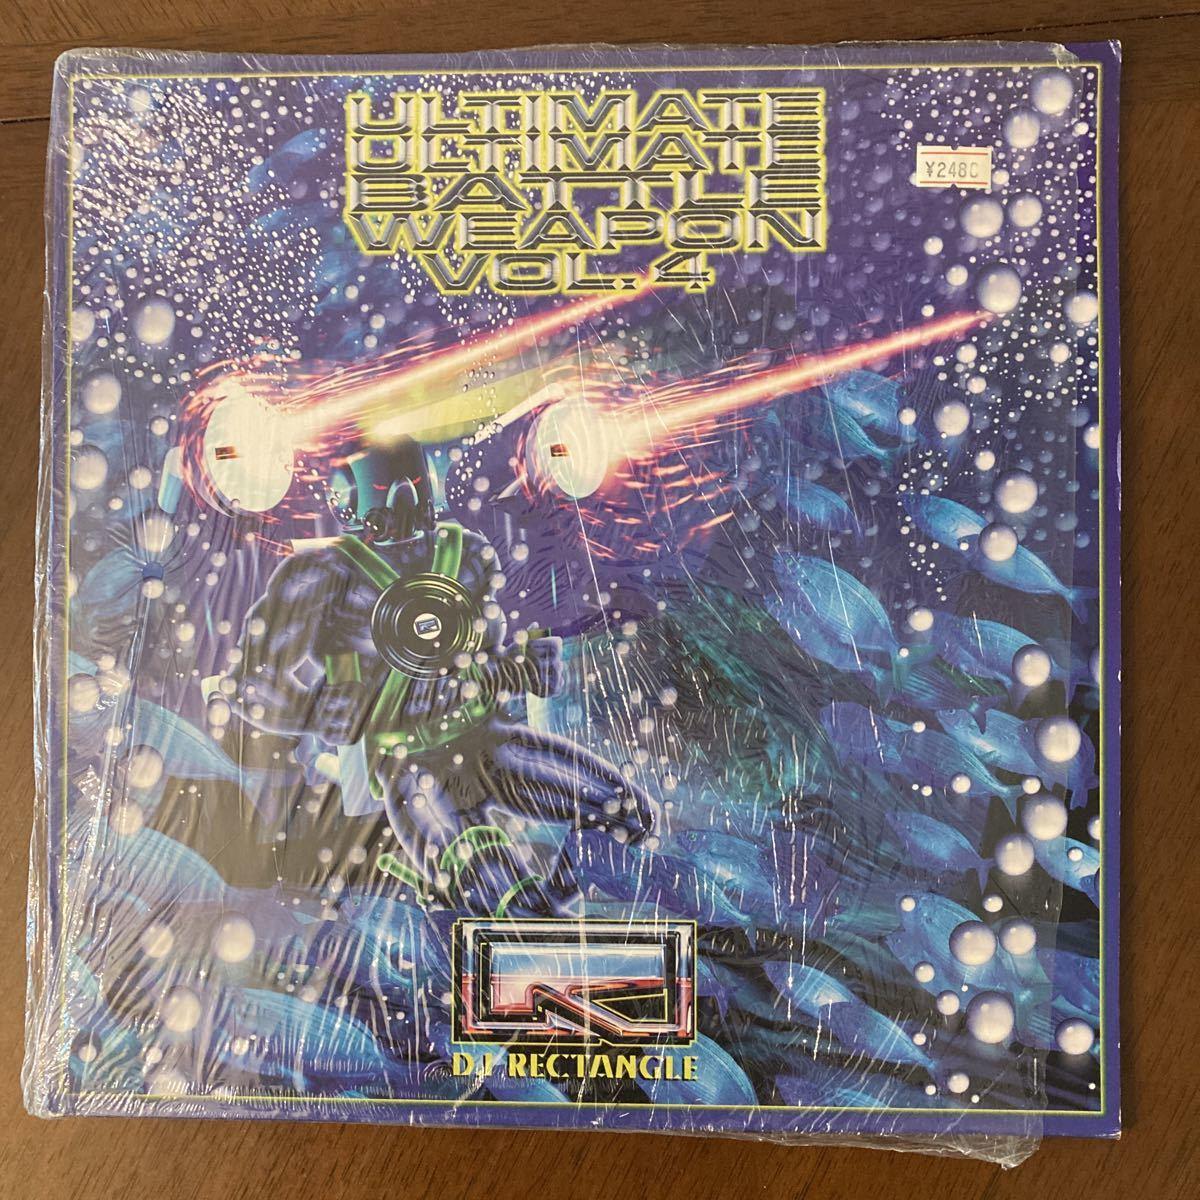 DJ Rectangle Ultimate Ultimate Battle Weapon Vol. 4 2LP バトルDJ